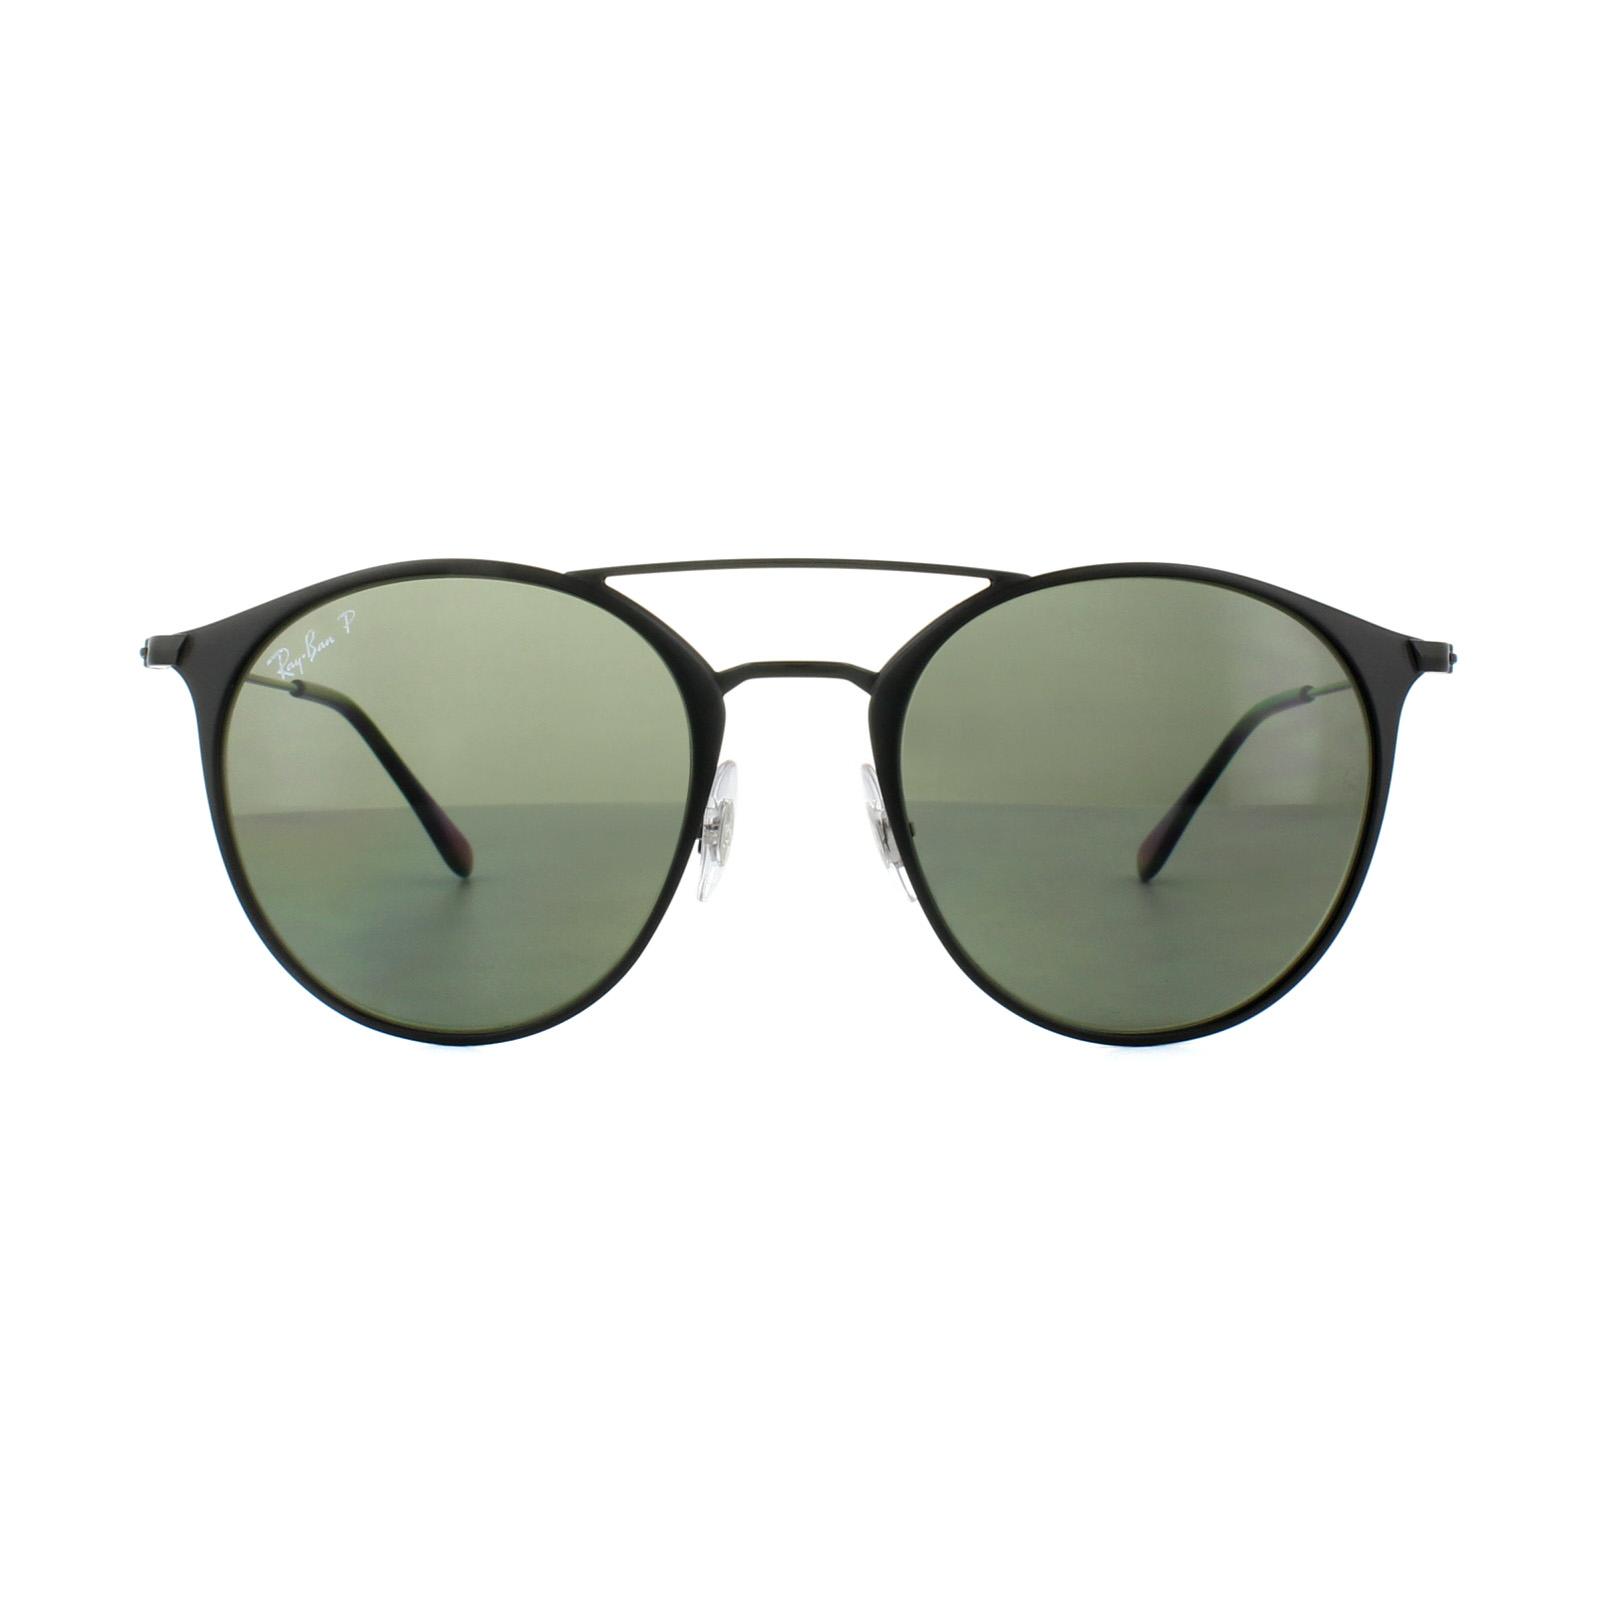 5b7e26434a7 Ray-Ban Sunglasses 3546 186 9A Black Green Polarized 8053672672428 ...